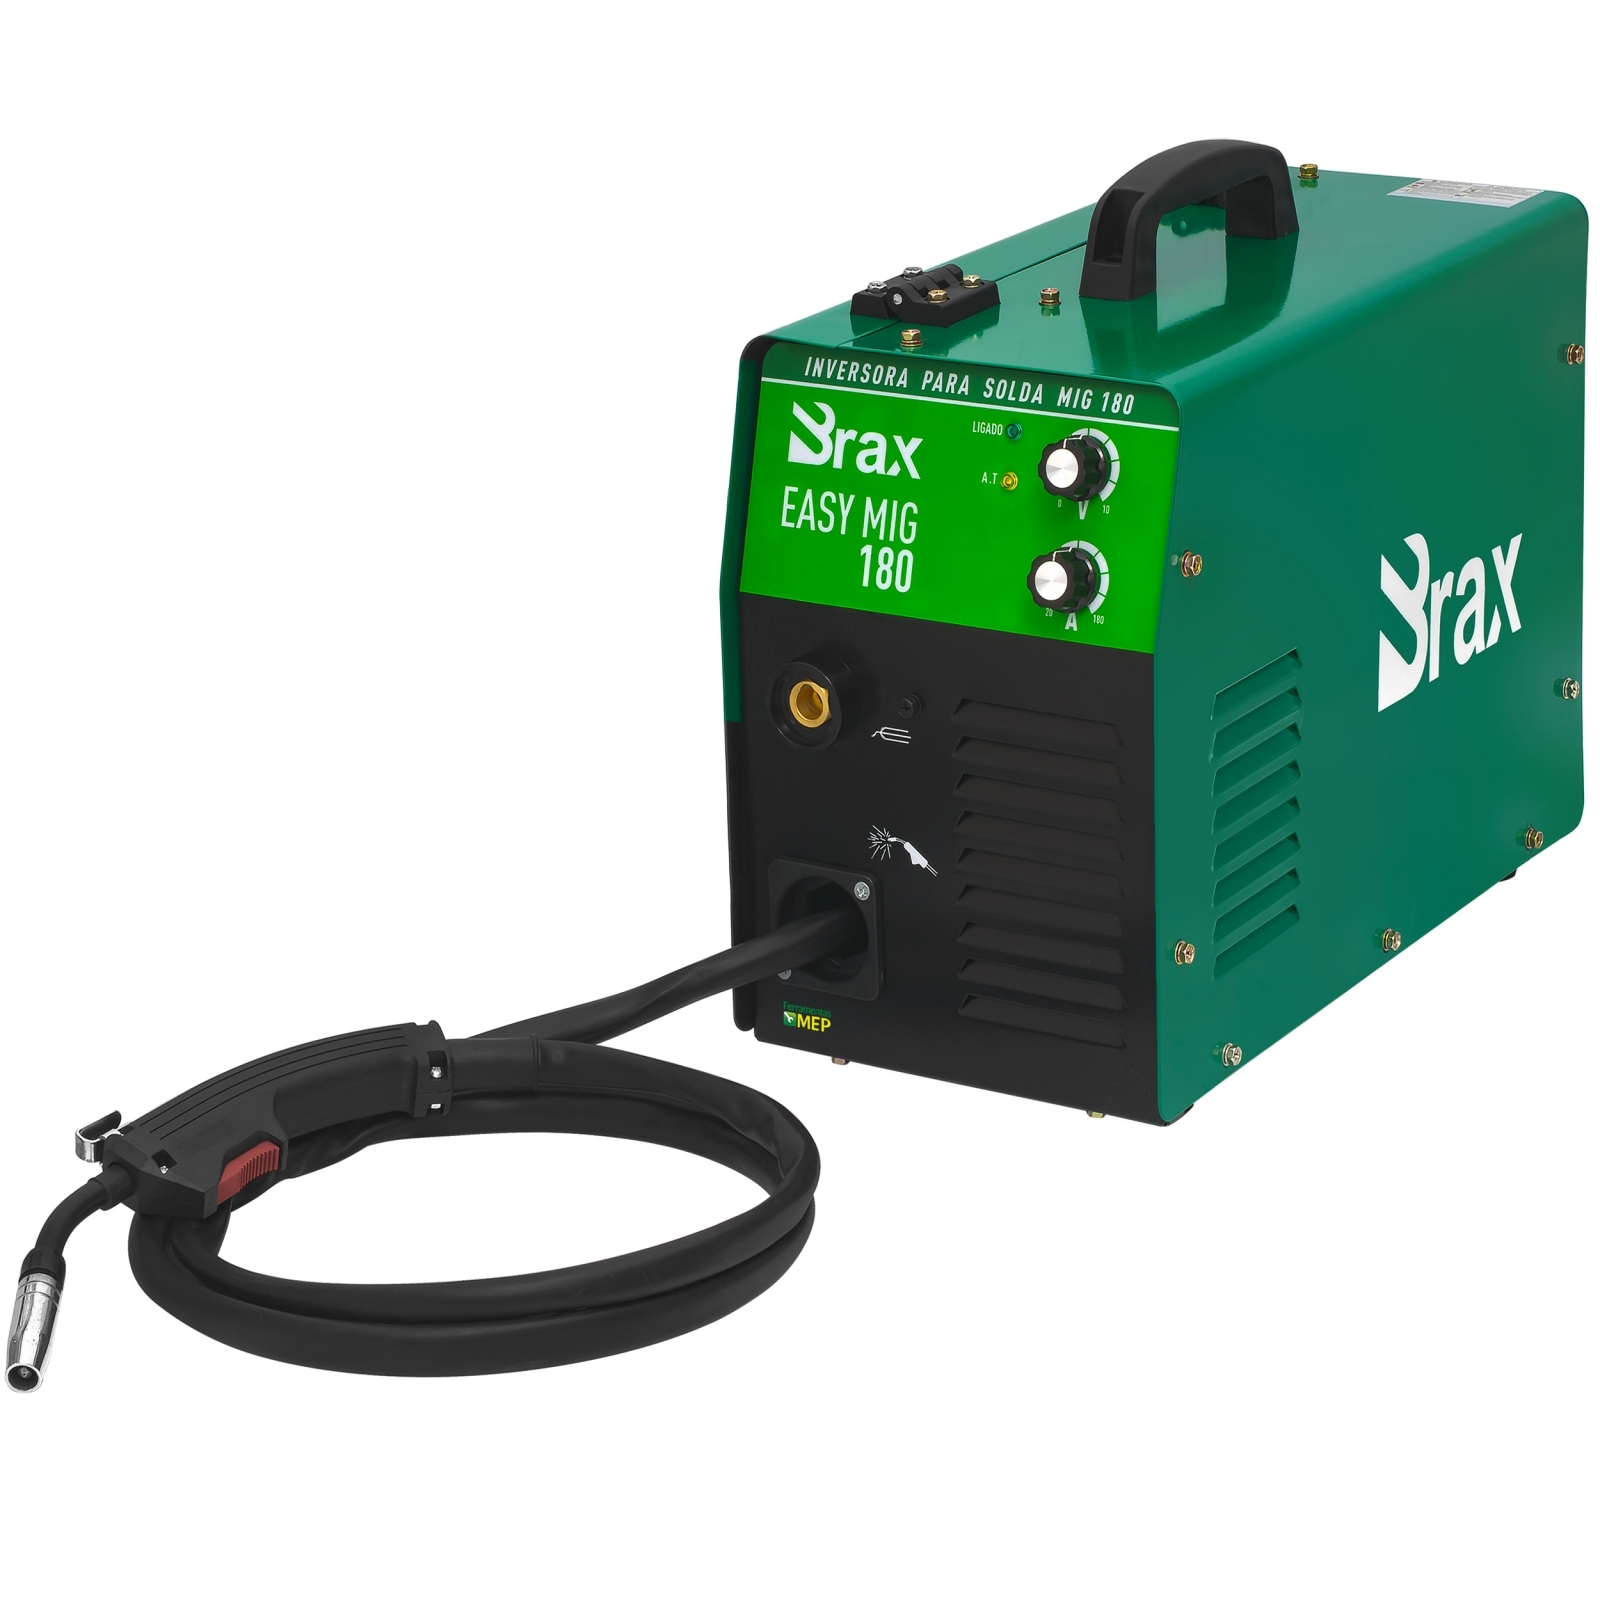 Máquina De Solda Mig Brax 180amp Easy Mig - Ferramentas MEP